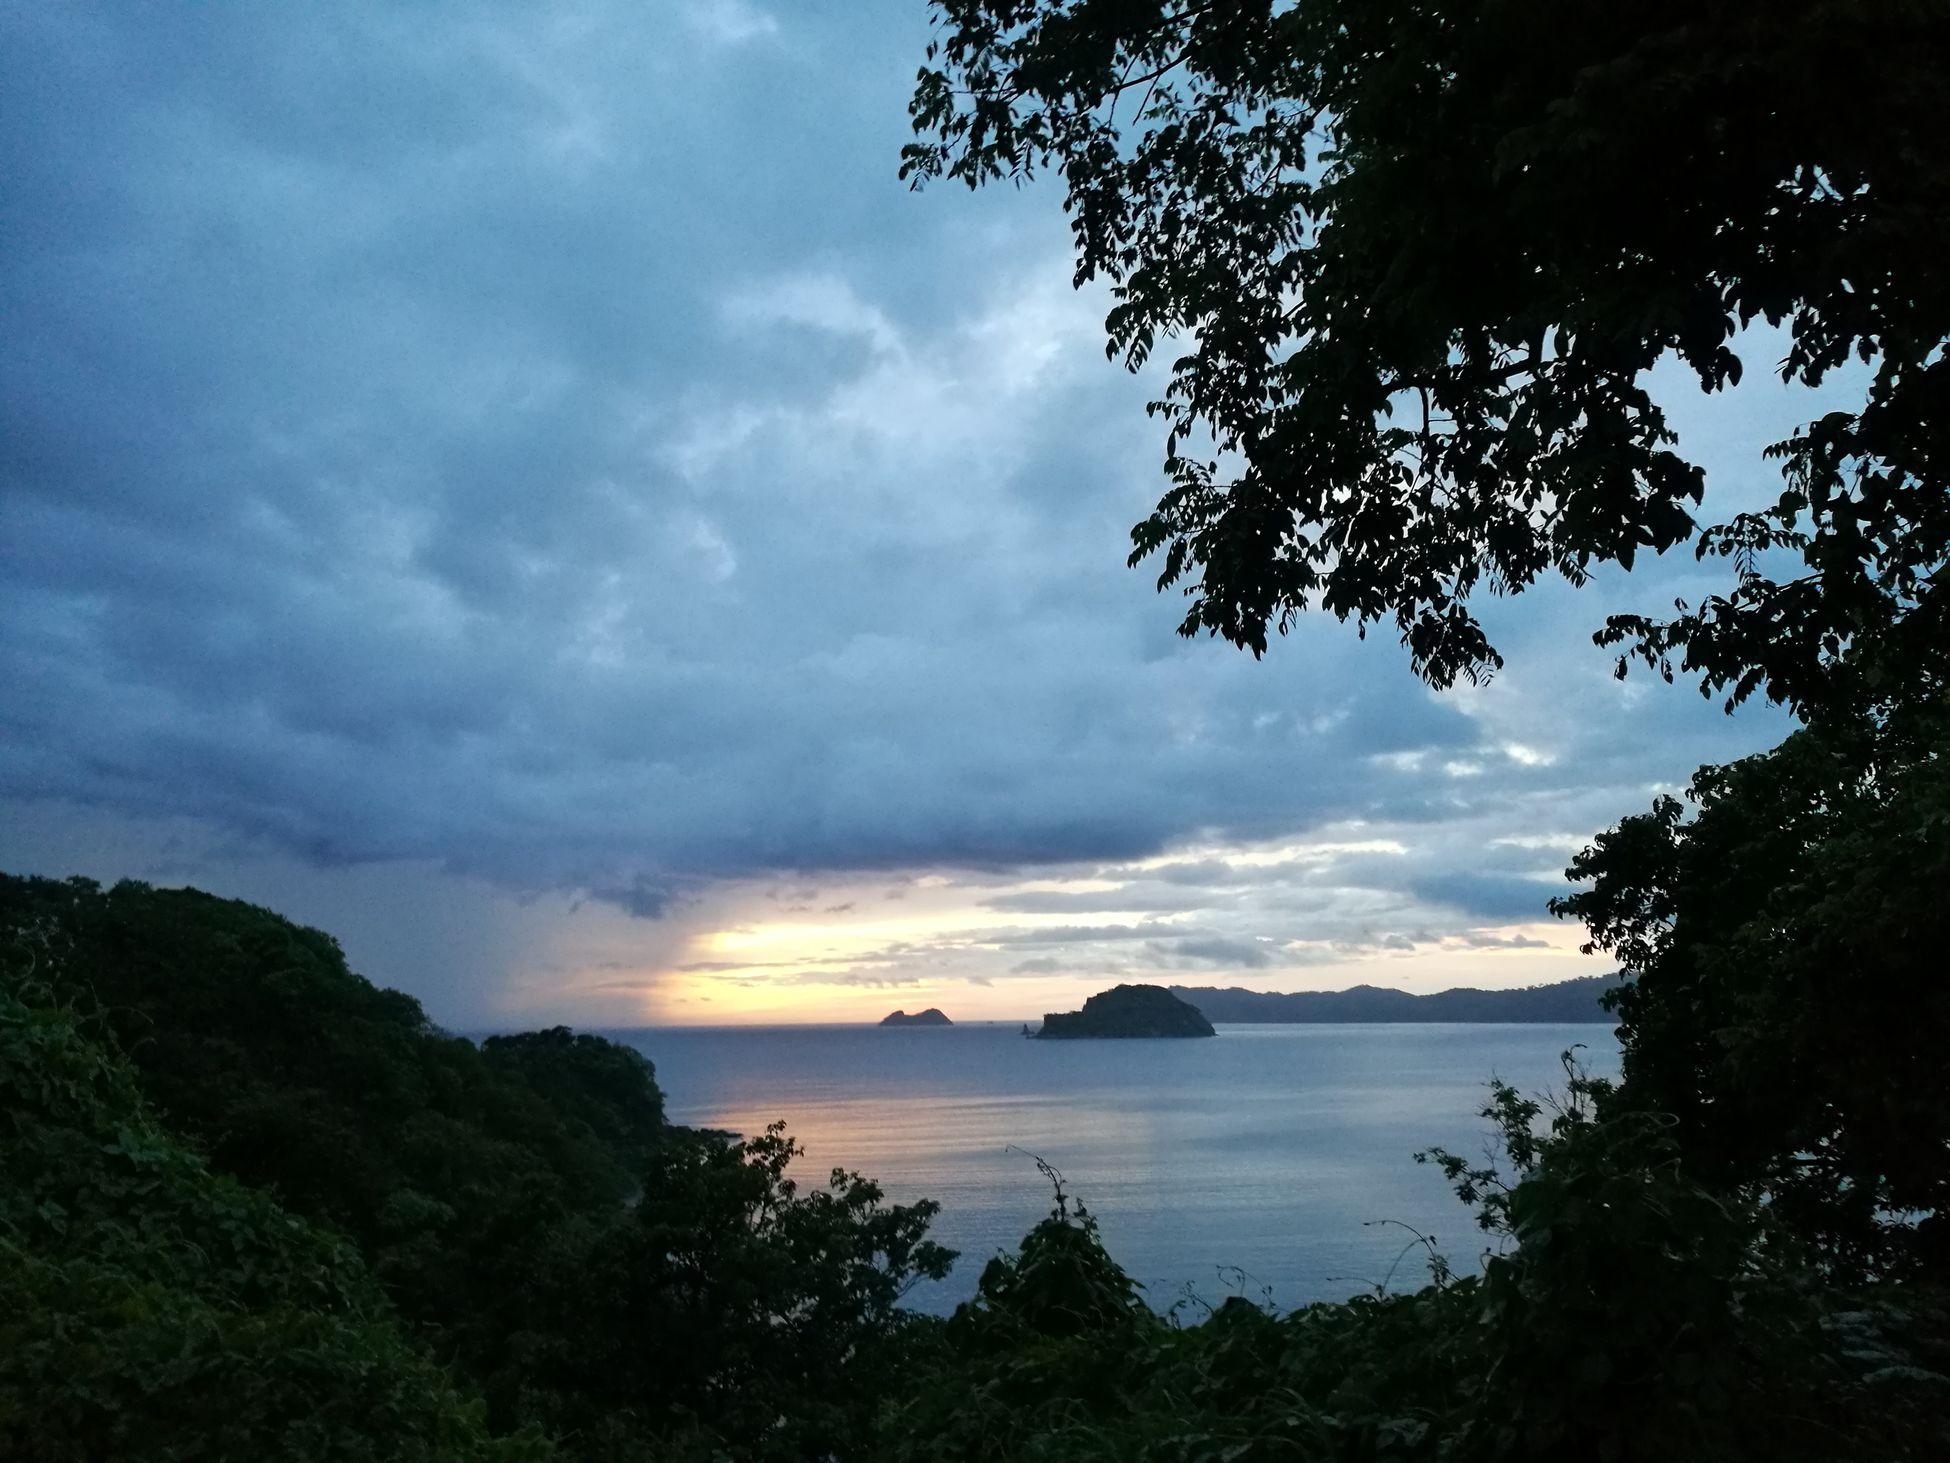 Reserva Biológica Junquillal Parque Nacional Santa Rosa Naturaleza Nature Sea Beach Guanacaste  Costa Rica Pura Vida Playa Vacations Nature Outdoors Sunset